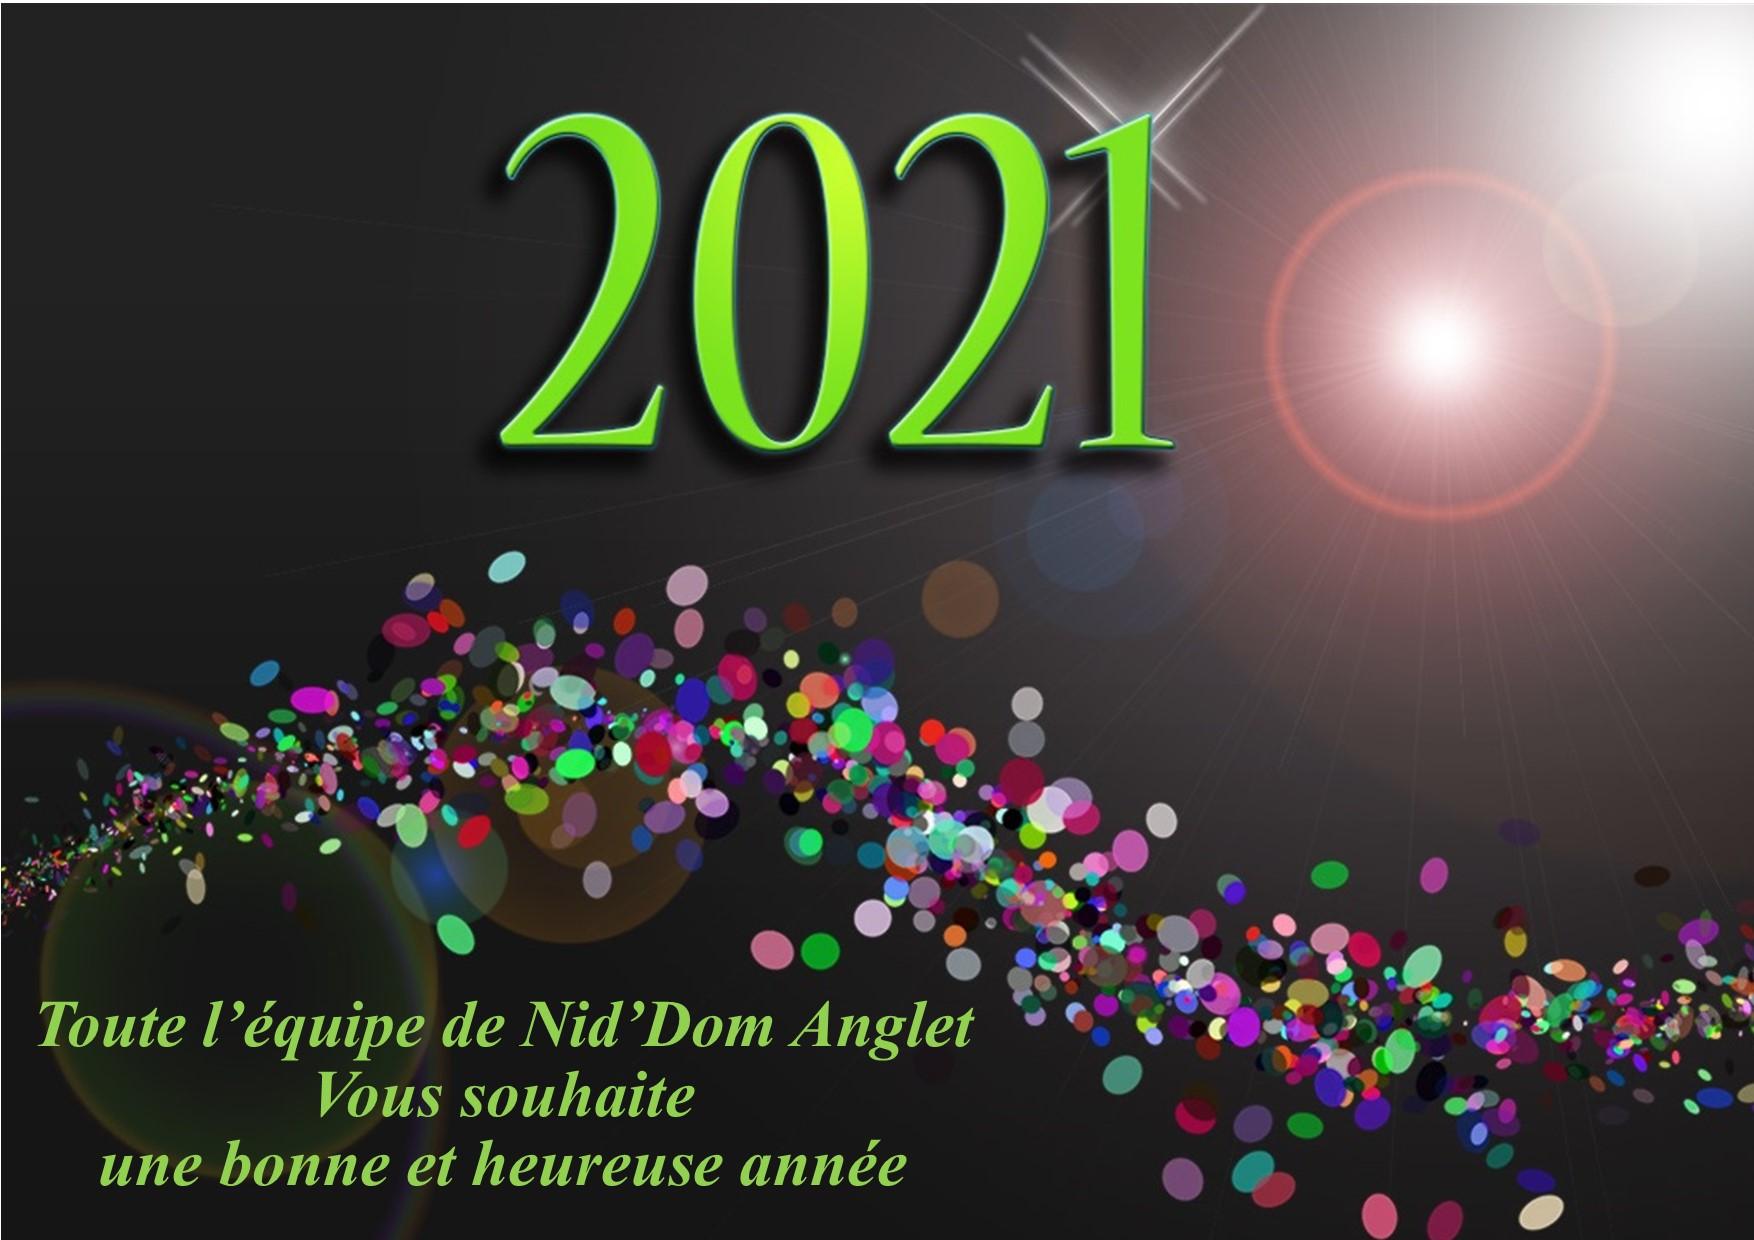 Meilleurs voeux Nid'Dom 2021